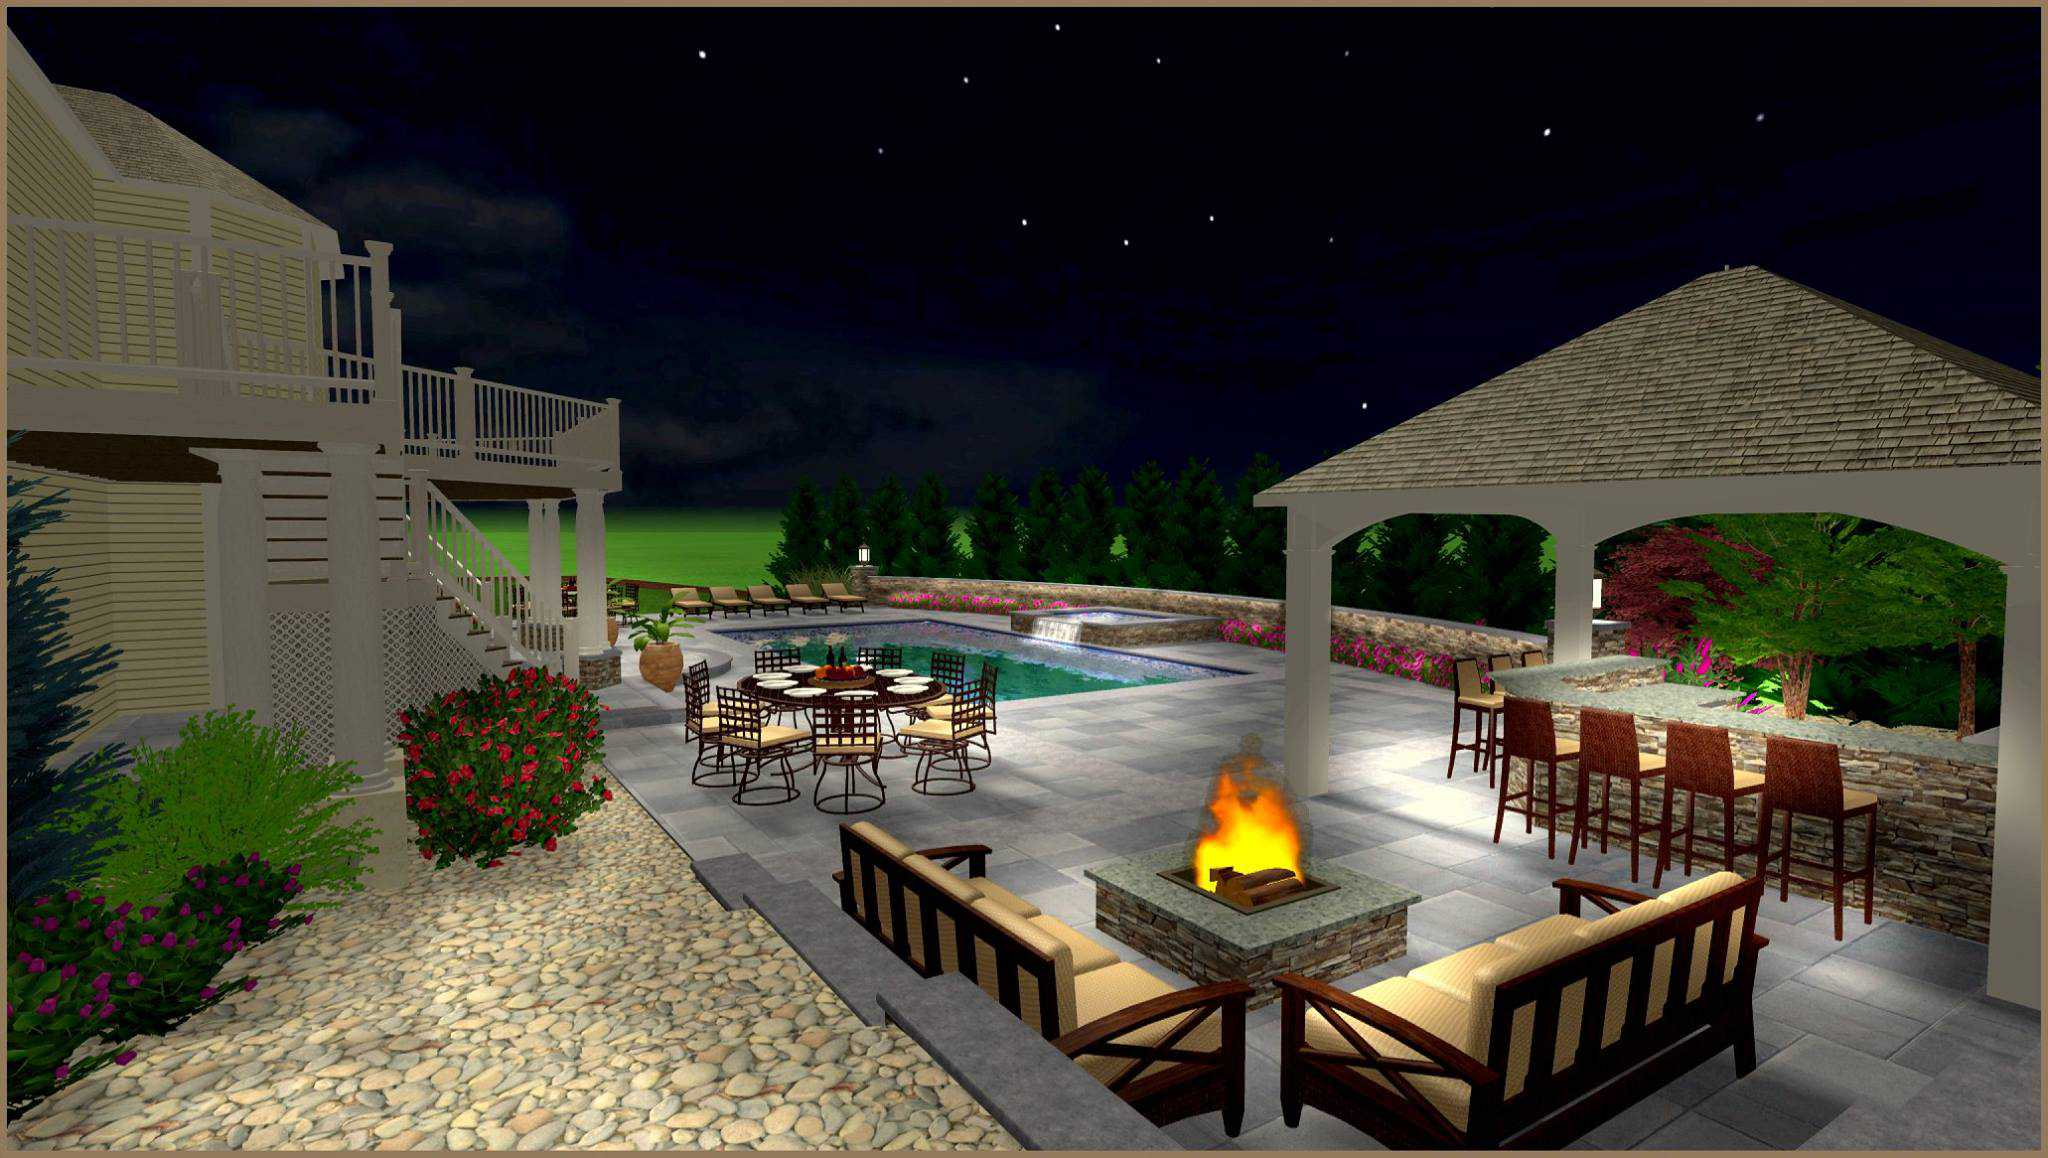 Design Renderings for Backyard Oasis on Designing A Backyard Oasis id=18256